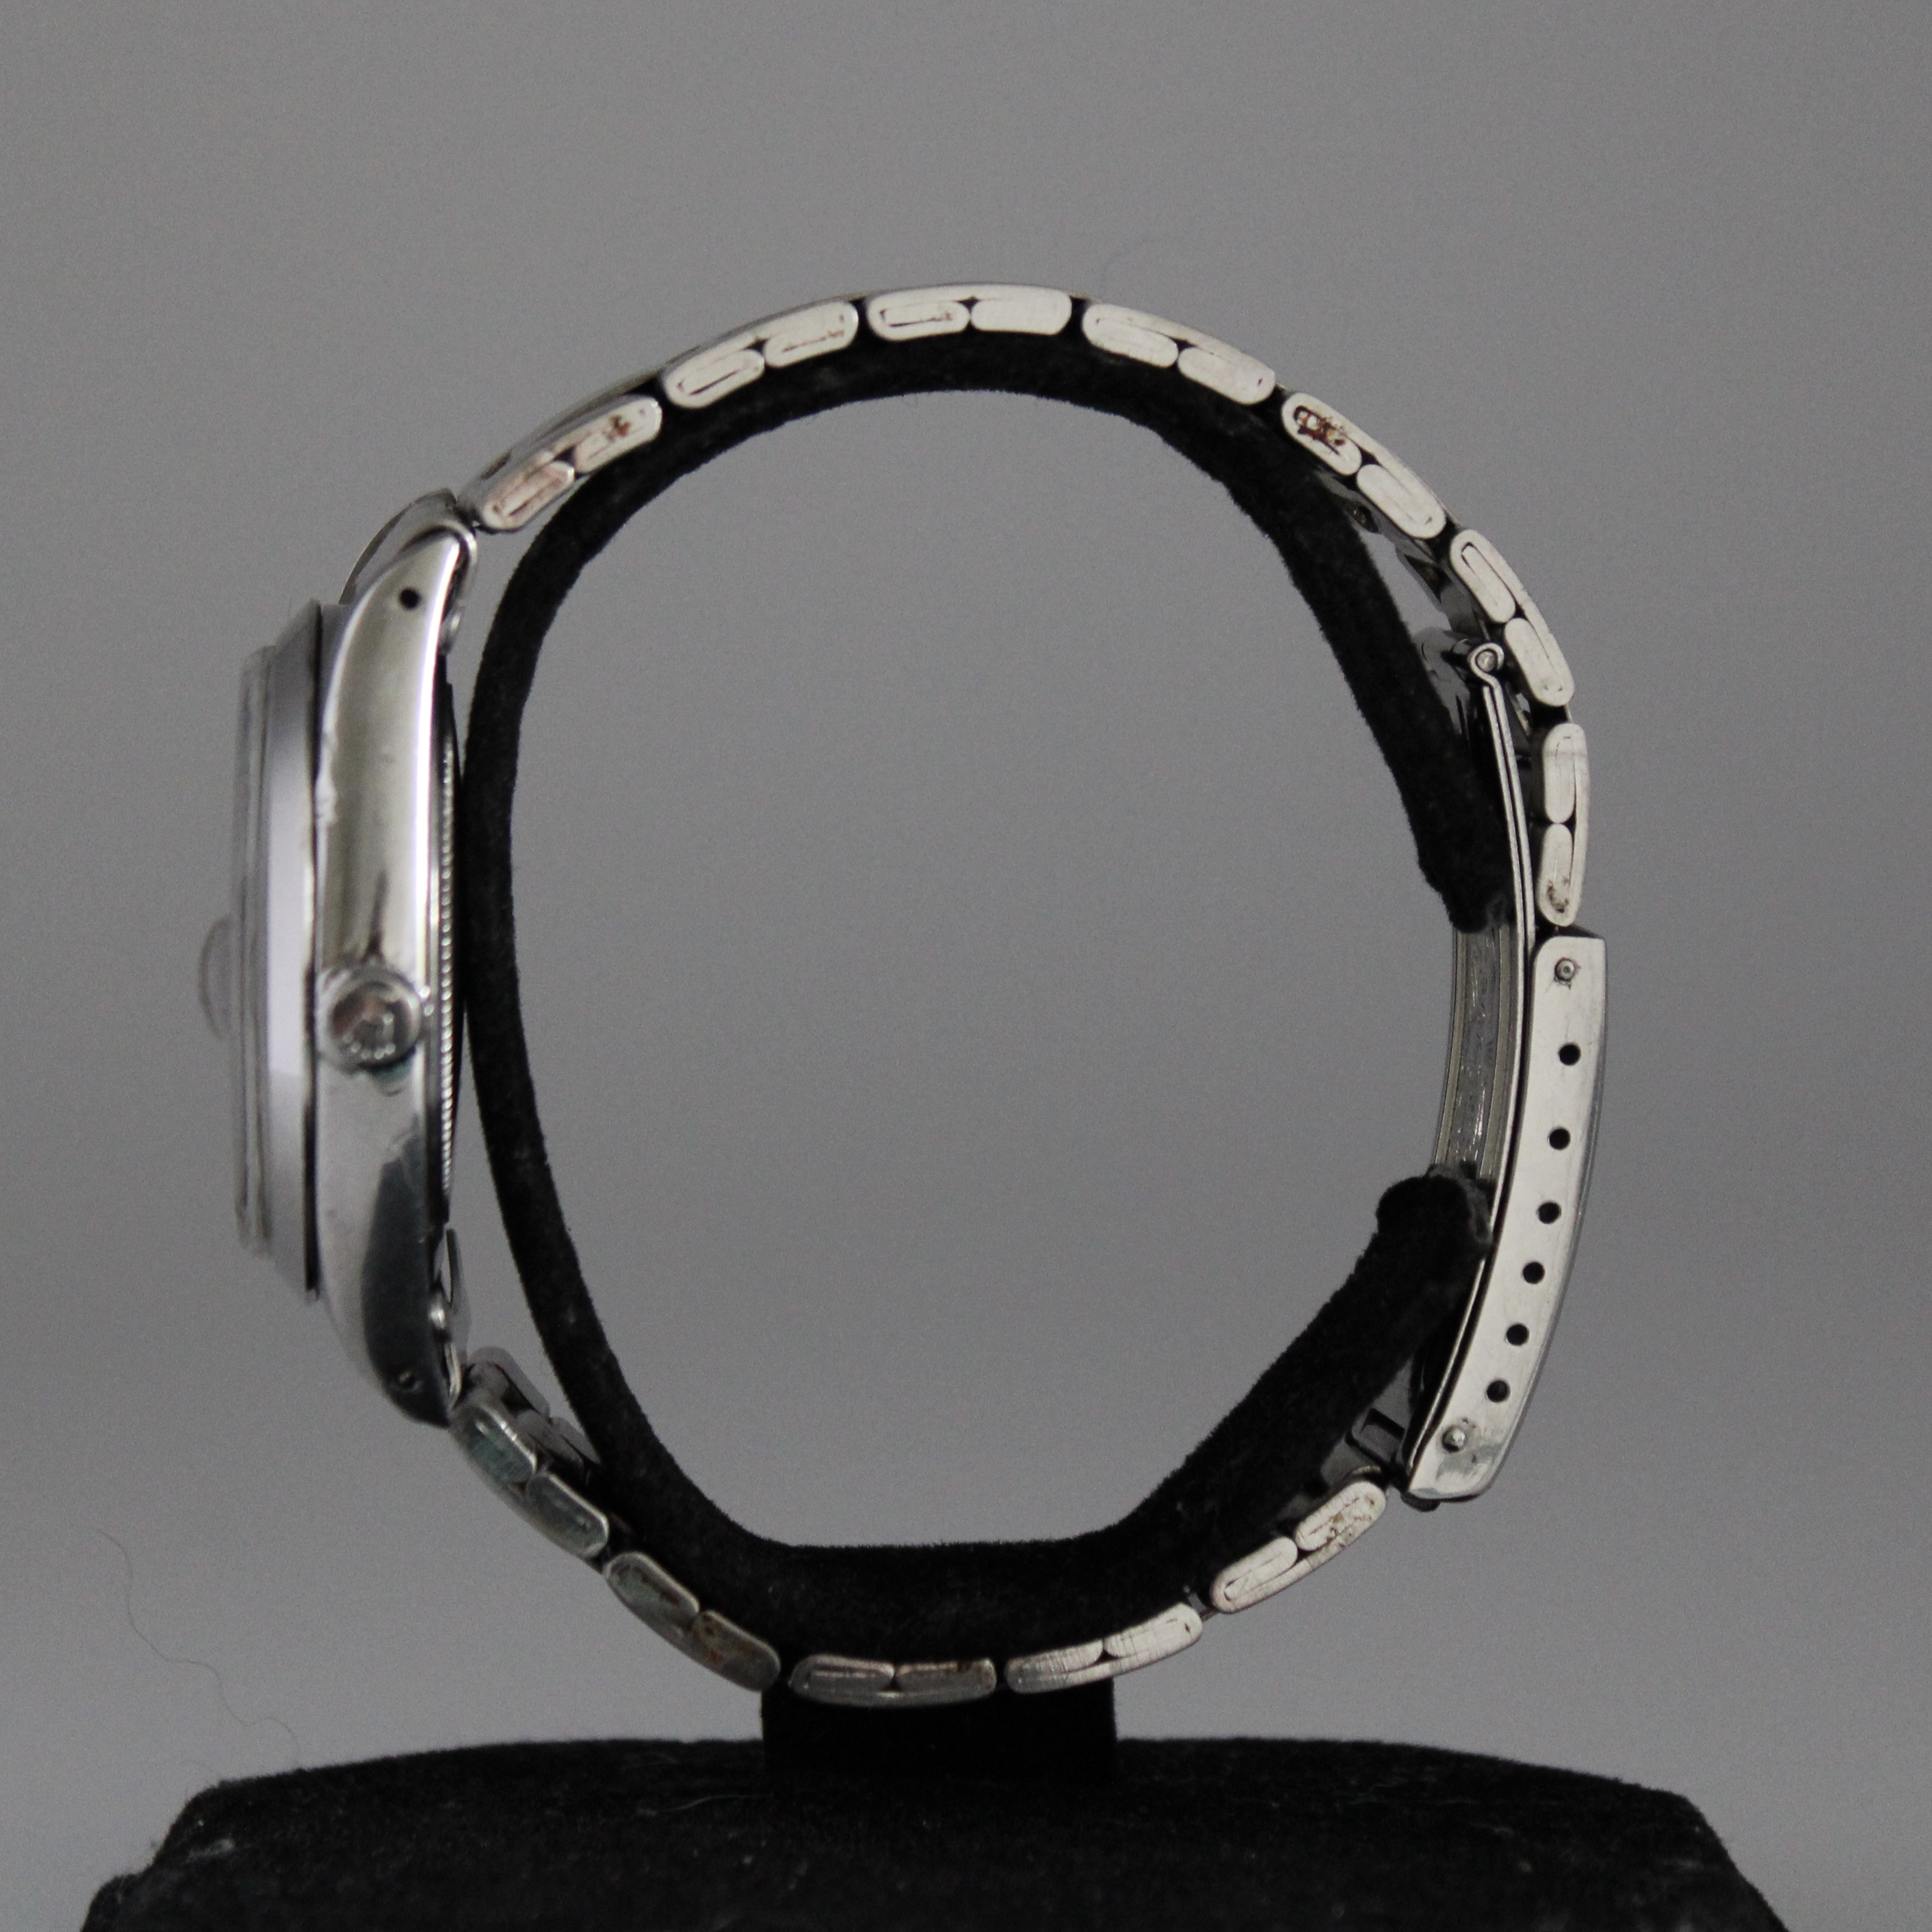 Rolex Oysterdate Precision ref 6694 - Image 3 of 6